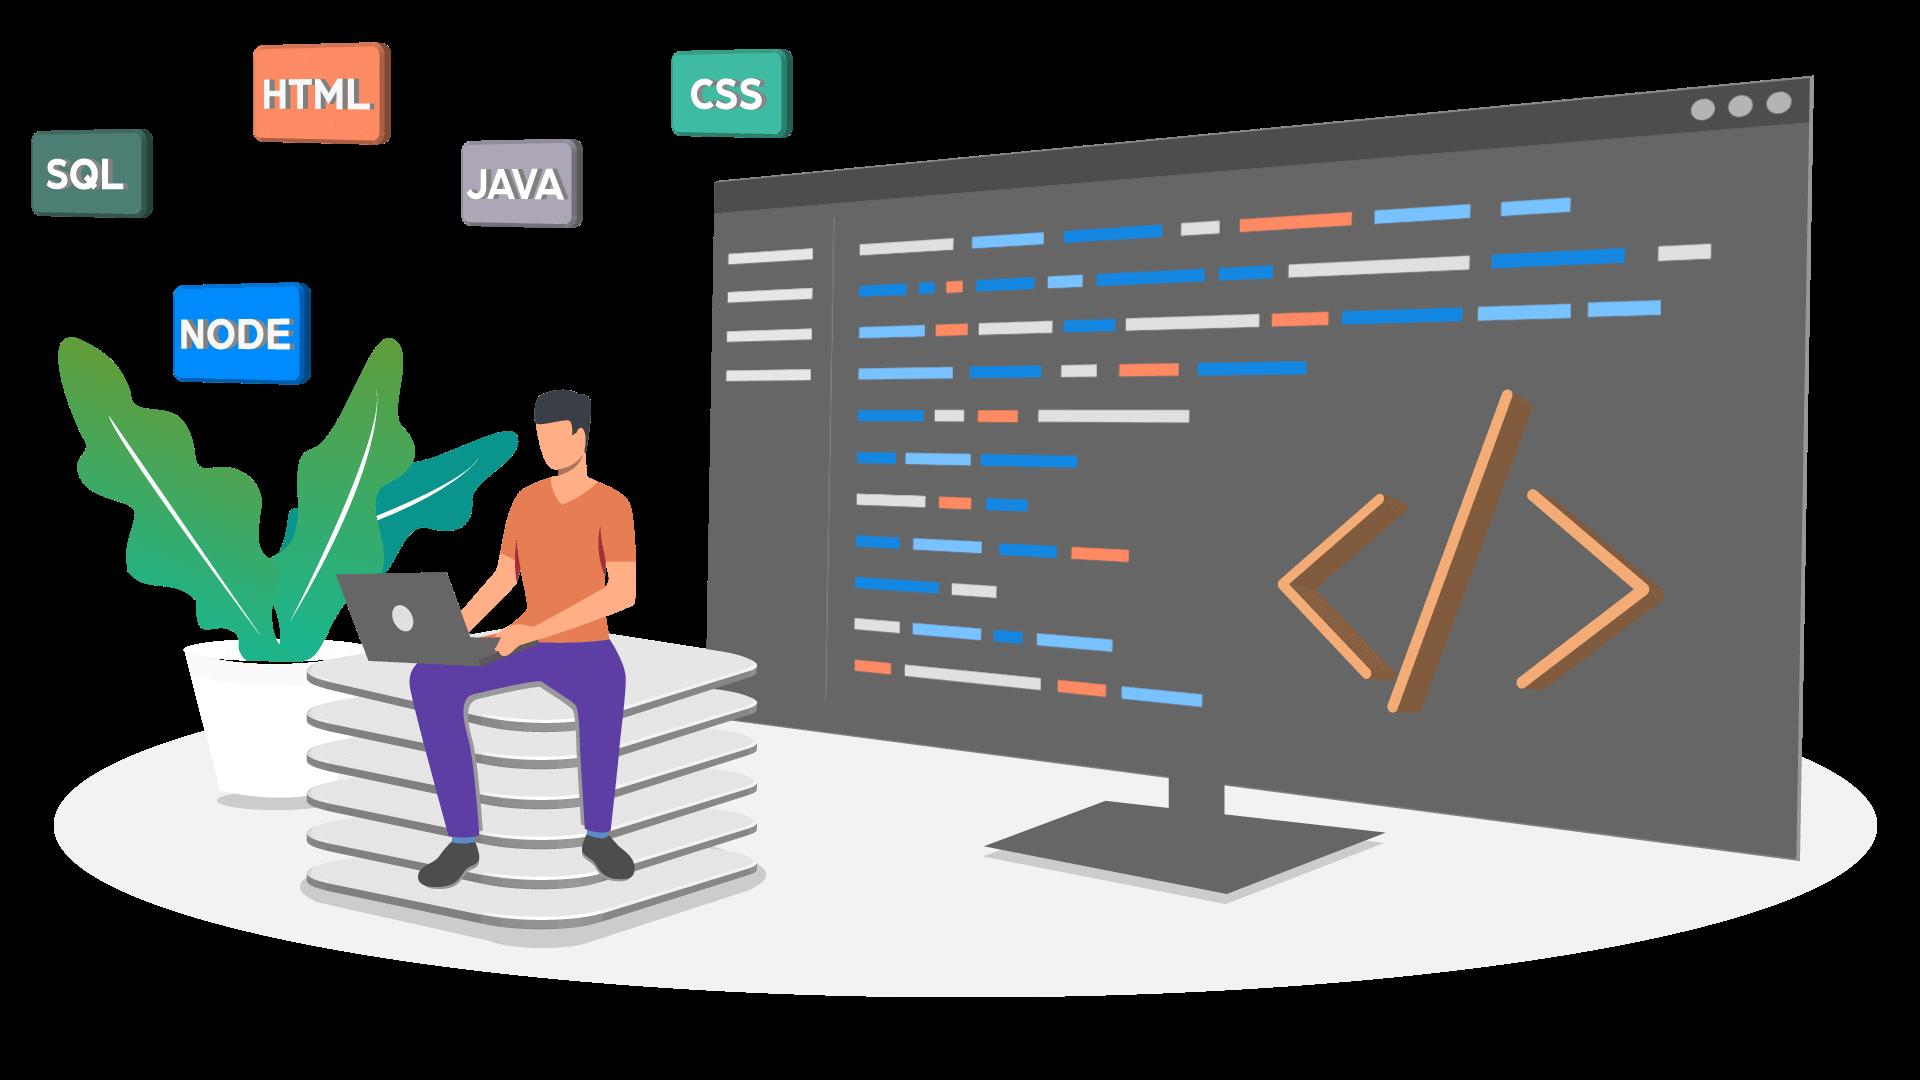 Person sitting, development, coding, HTML, SQL, NodeJS, CSS, Java, Angular